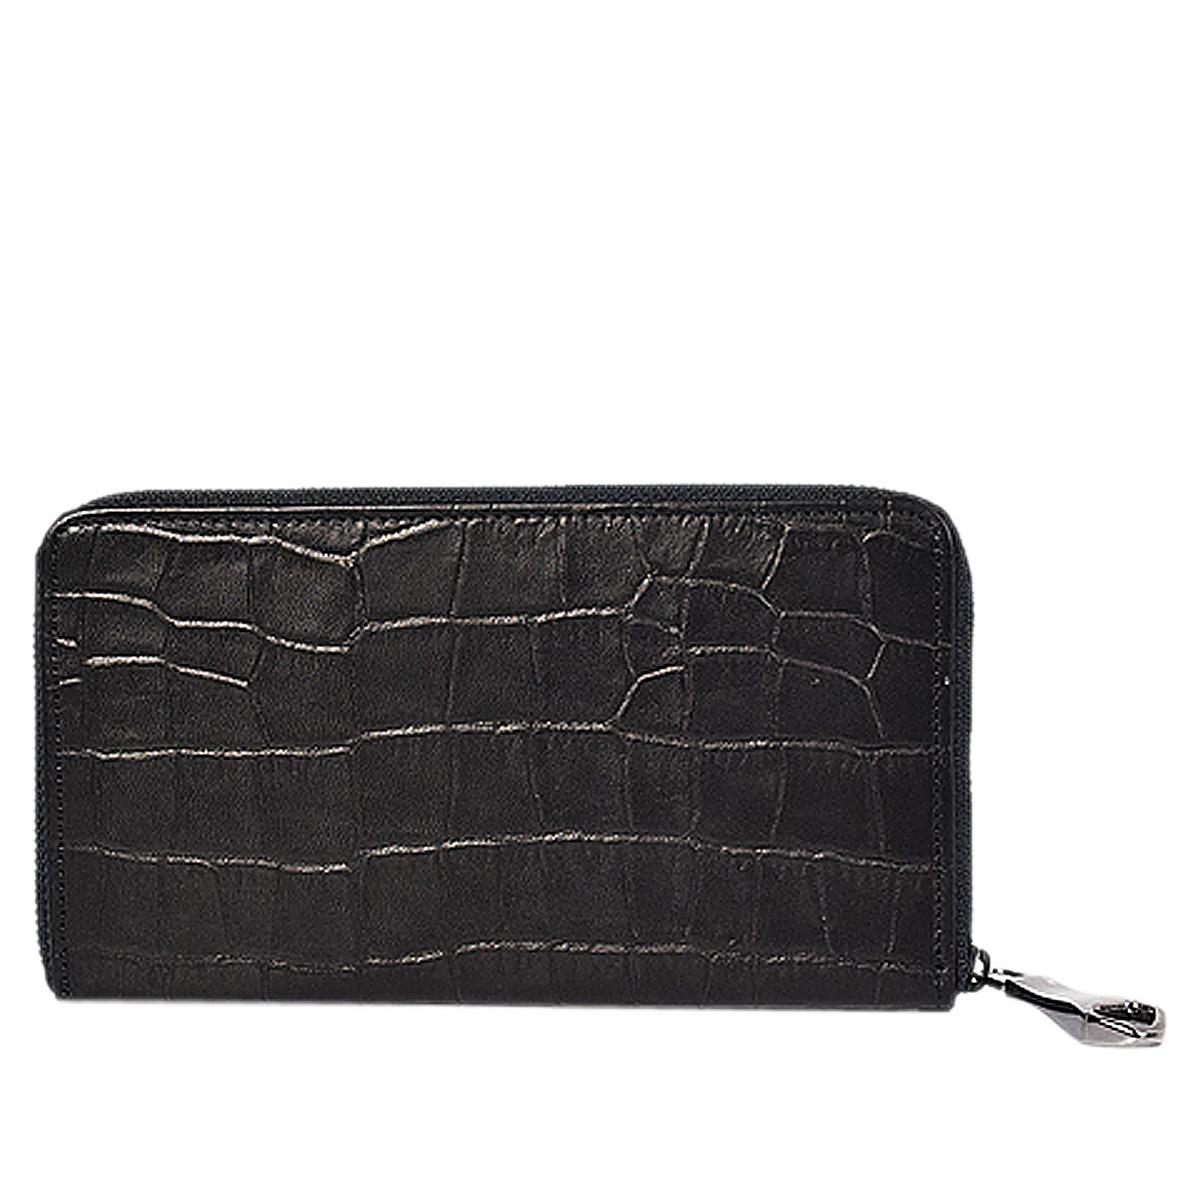 PRAY LONG WALLET プレイ 財布 長財布 メンズ ラウンドファスナー ブラック 黒 PRLW-303C